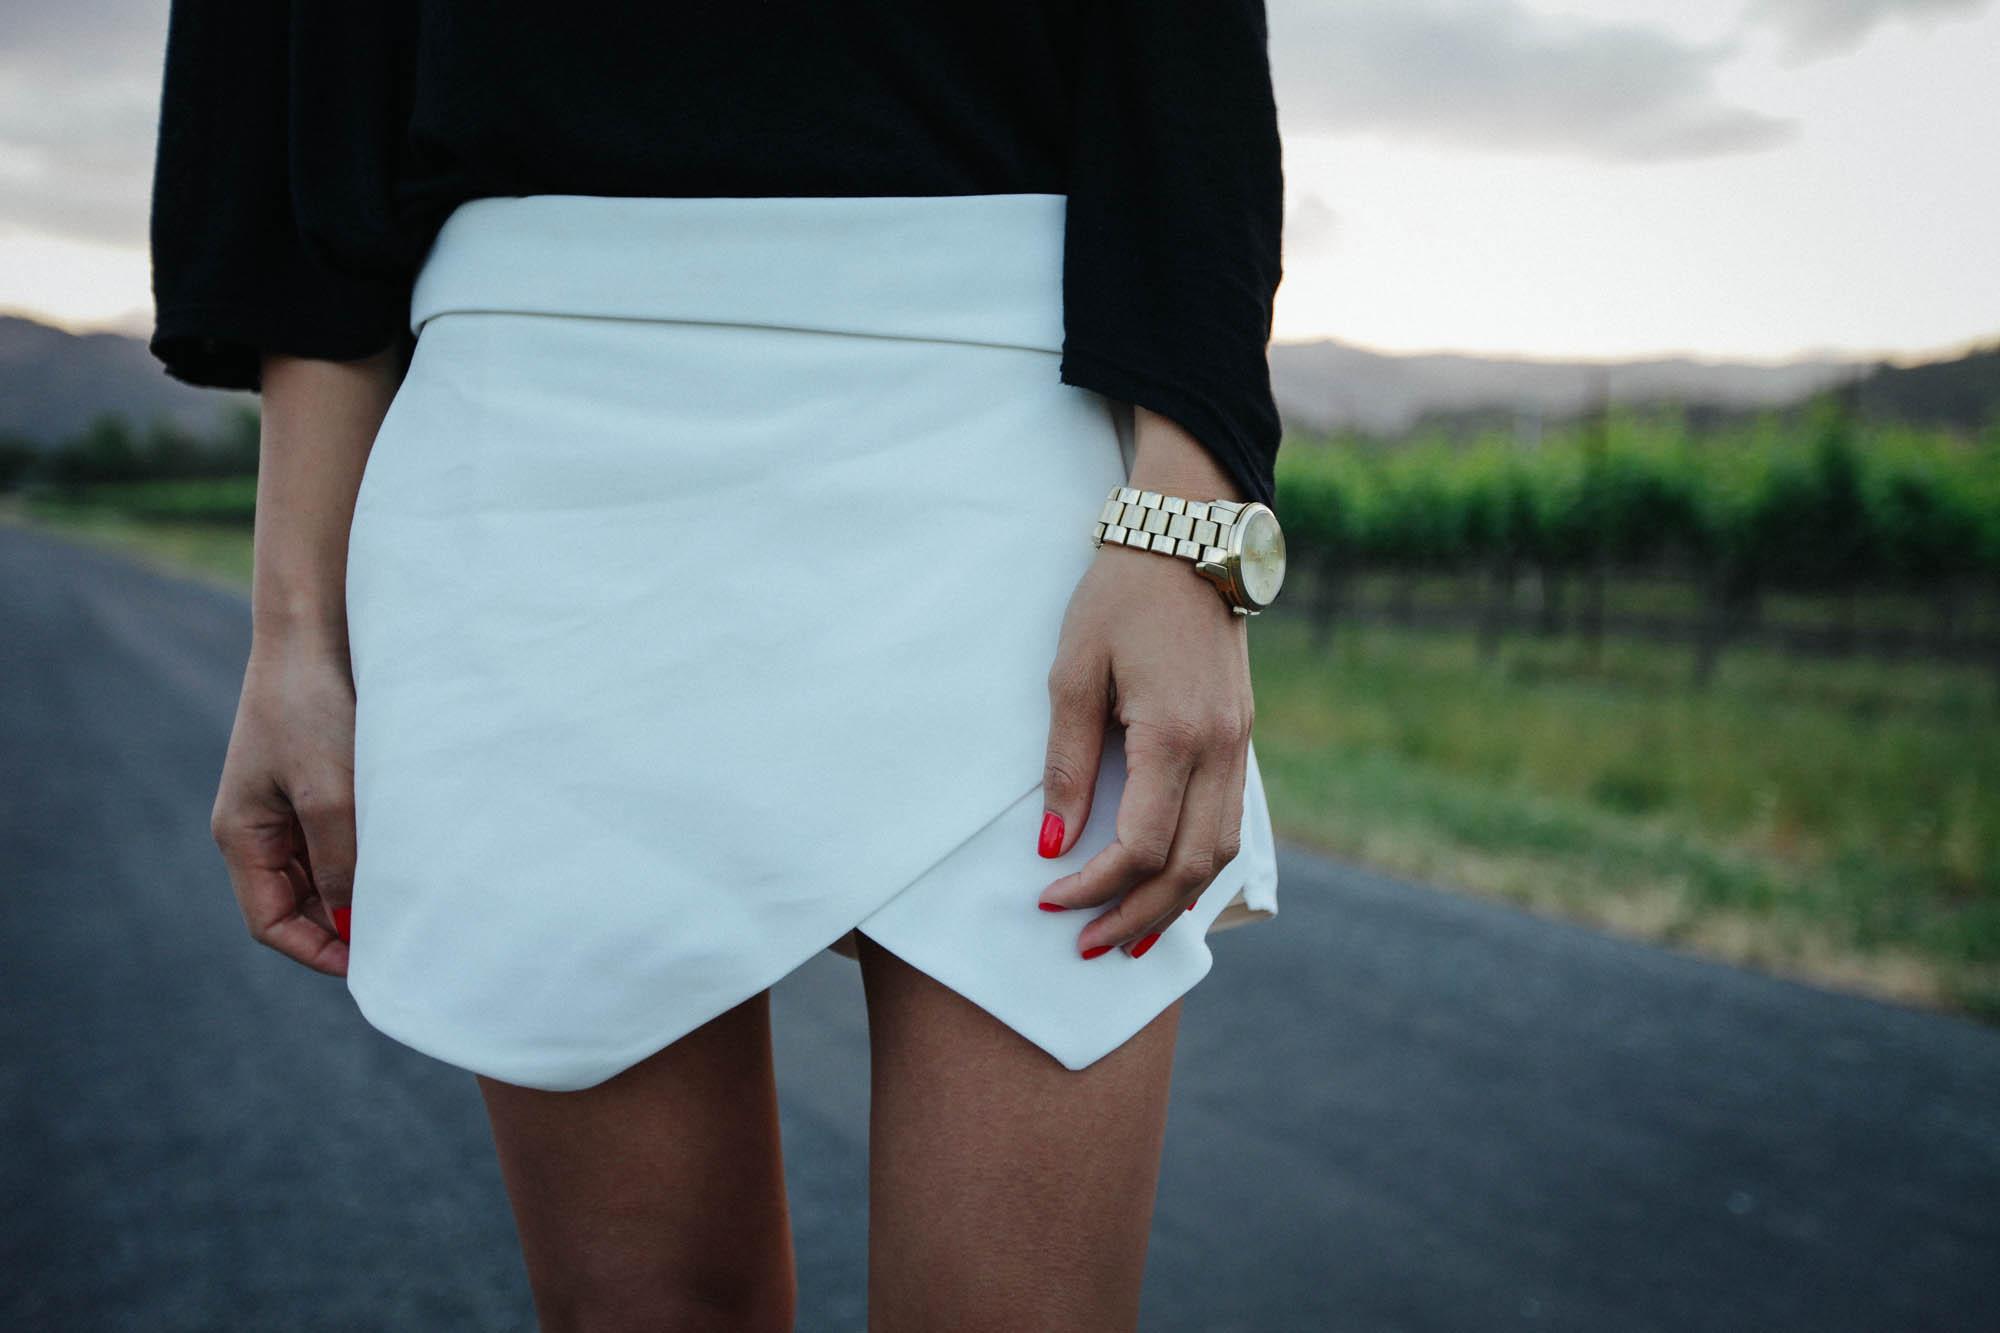 Zara skirt, LF Store top, Michael Kors watch, Ferragamo bag